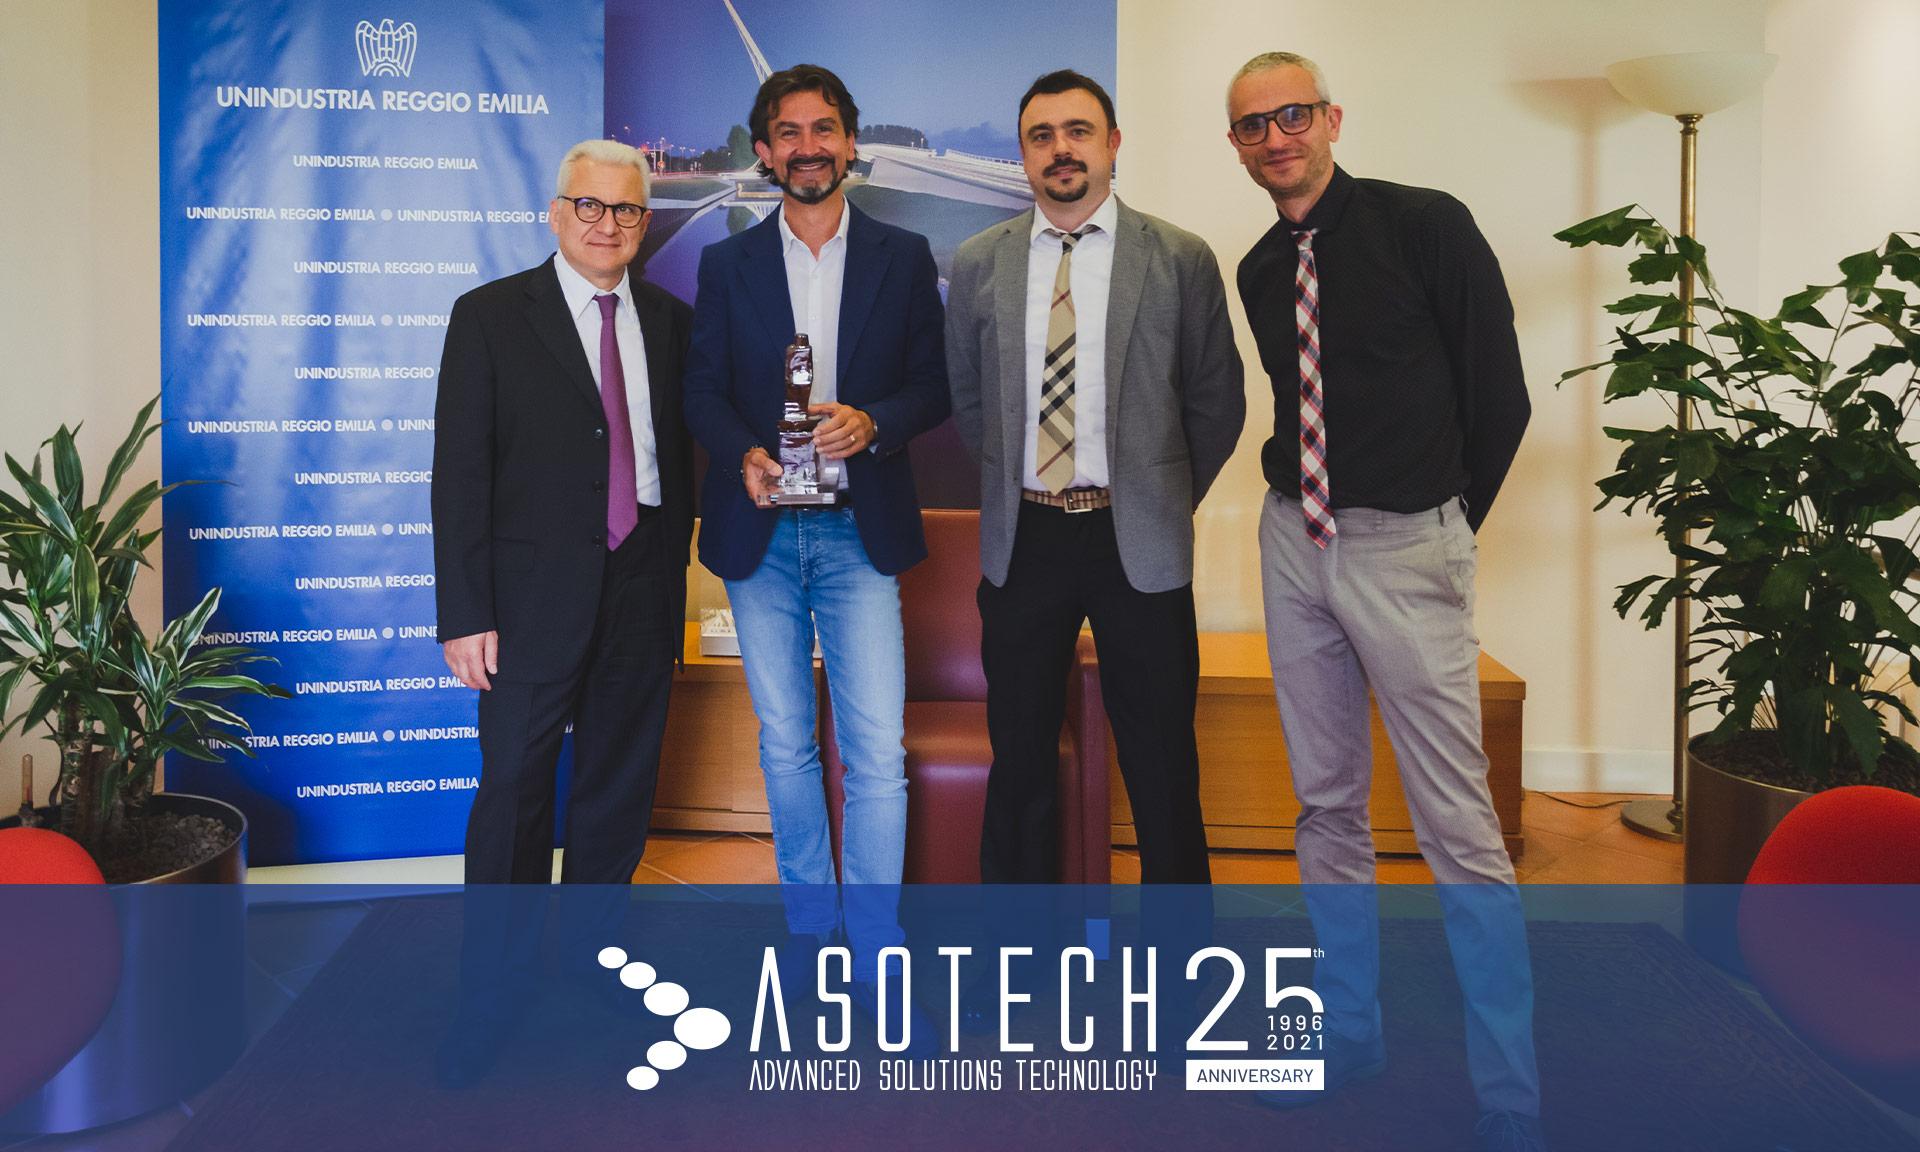 Asotech celebra 25 anni di attività